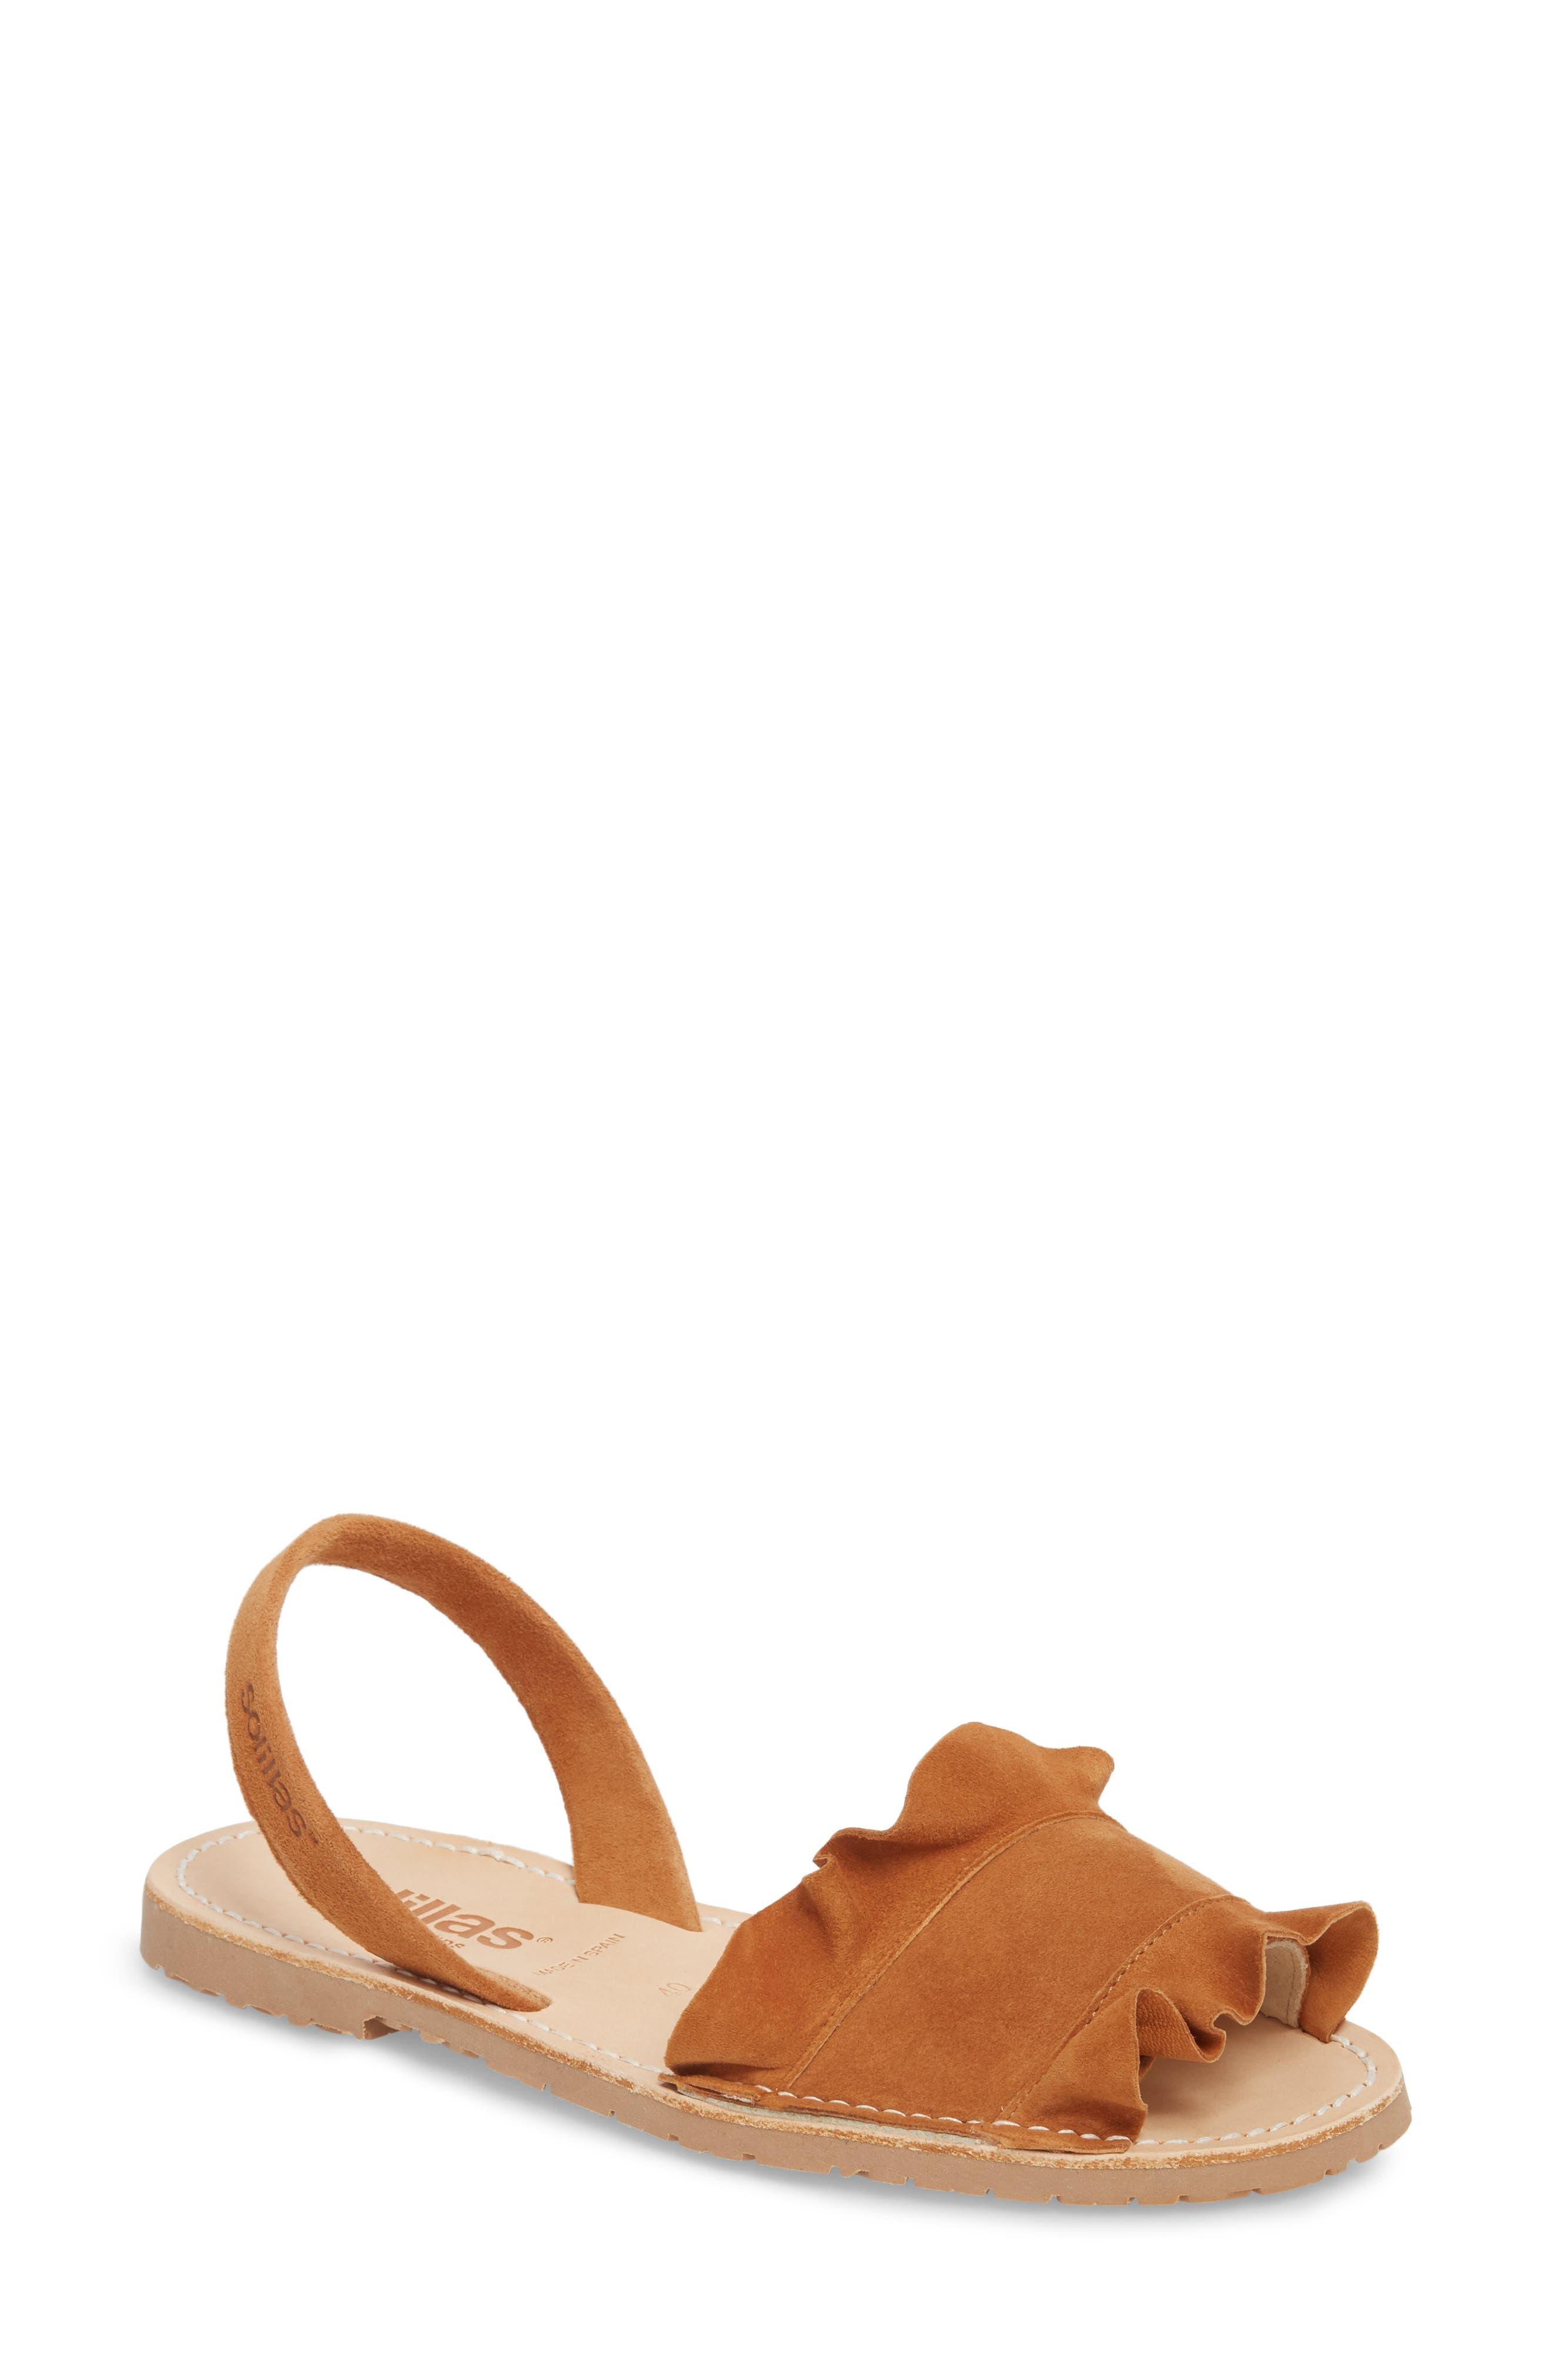 Frilled Flat Sandal,                             Main thumbnail 1, color,                             Tan